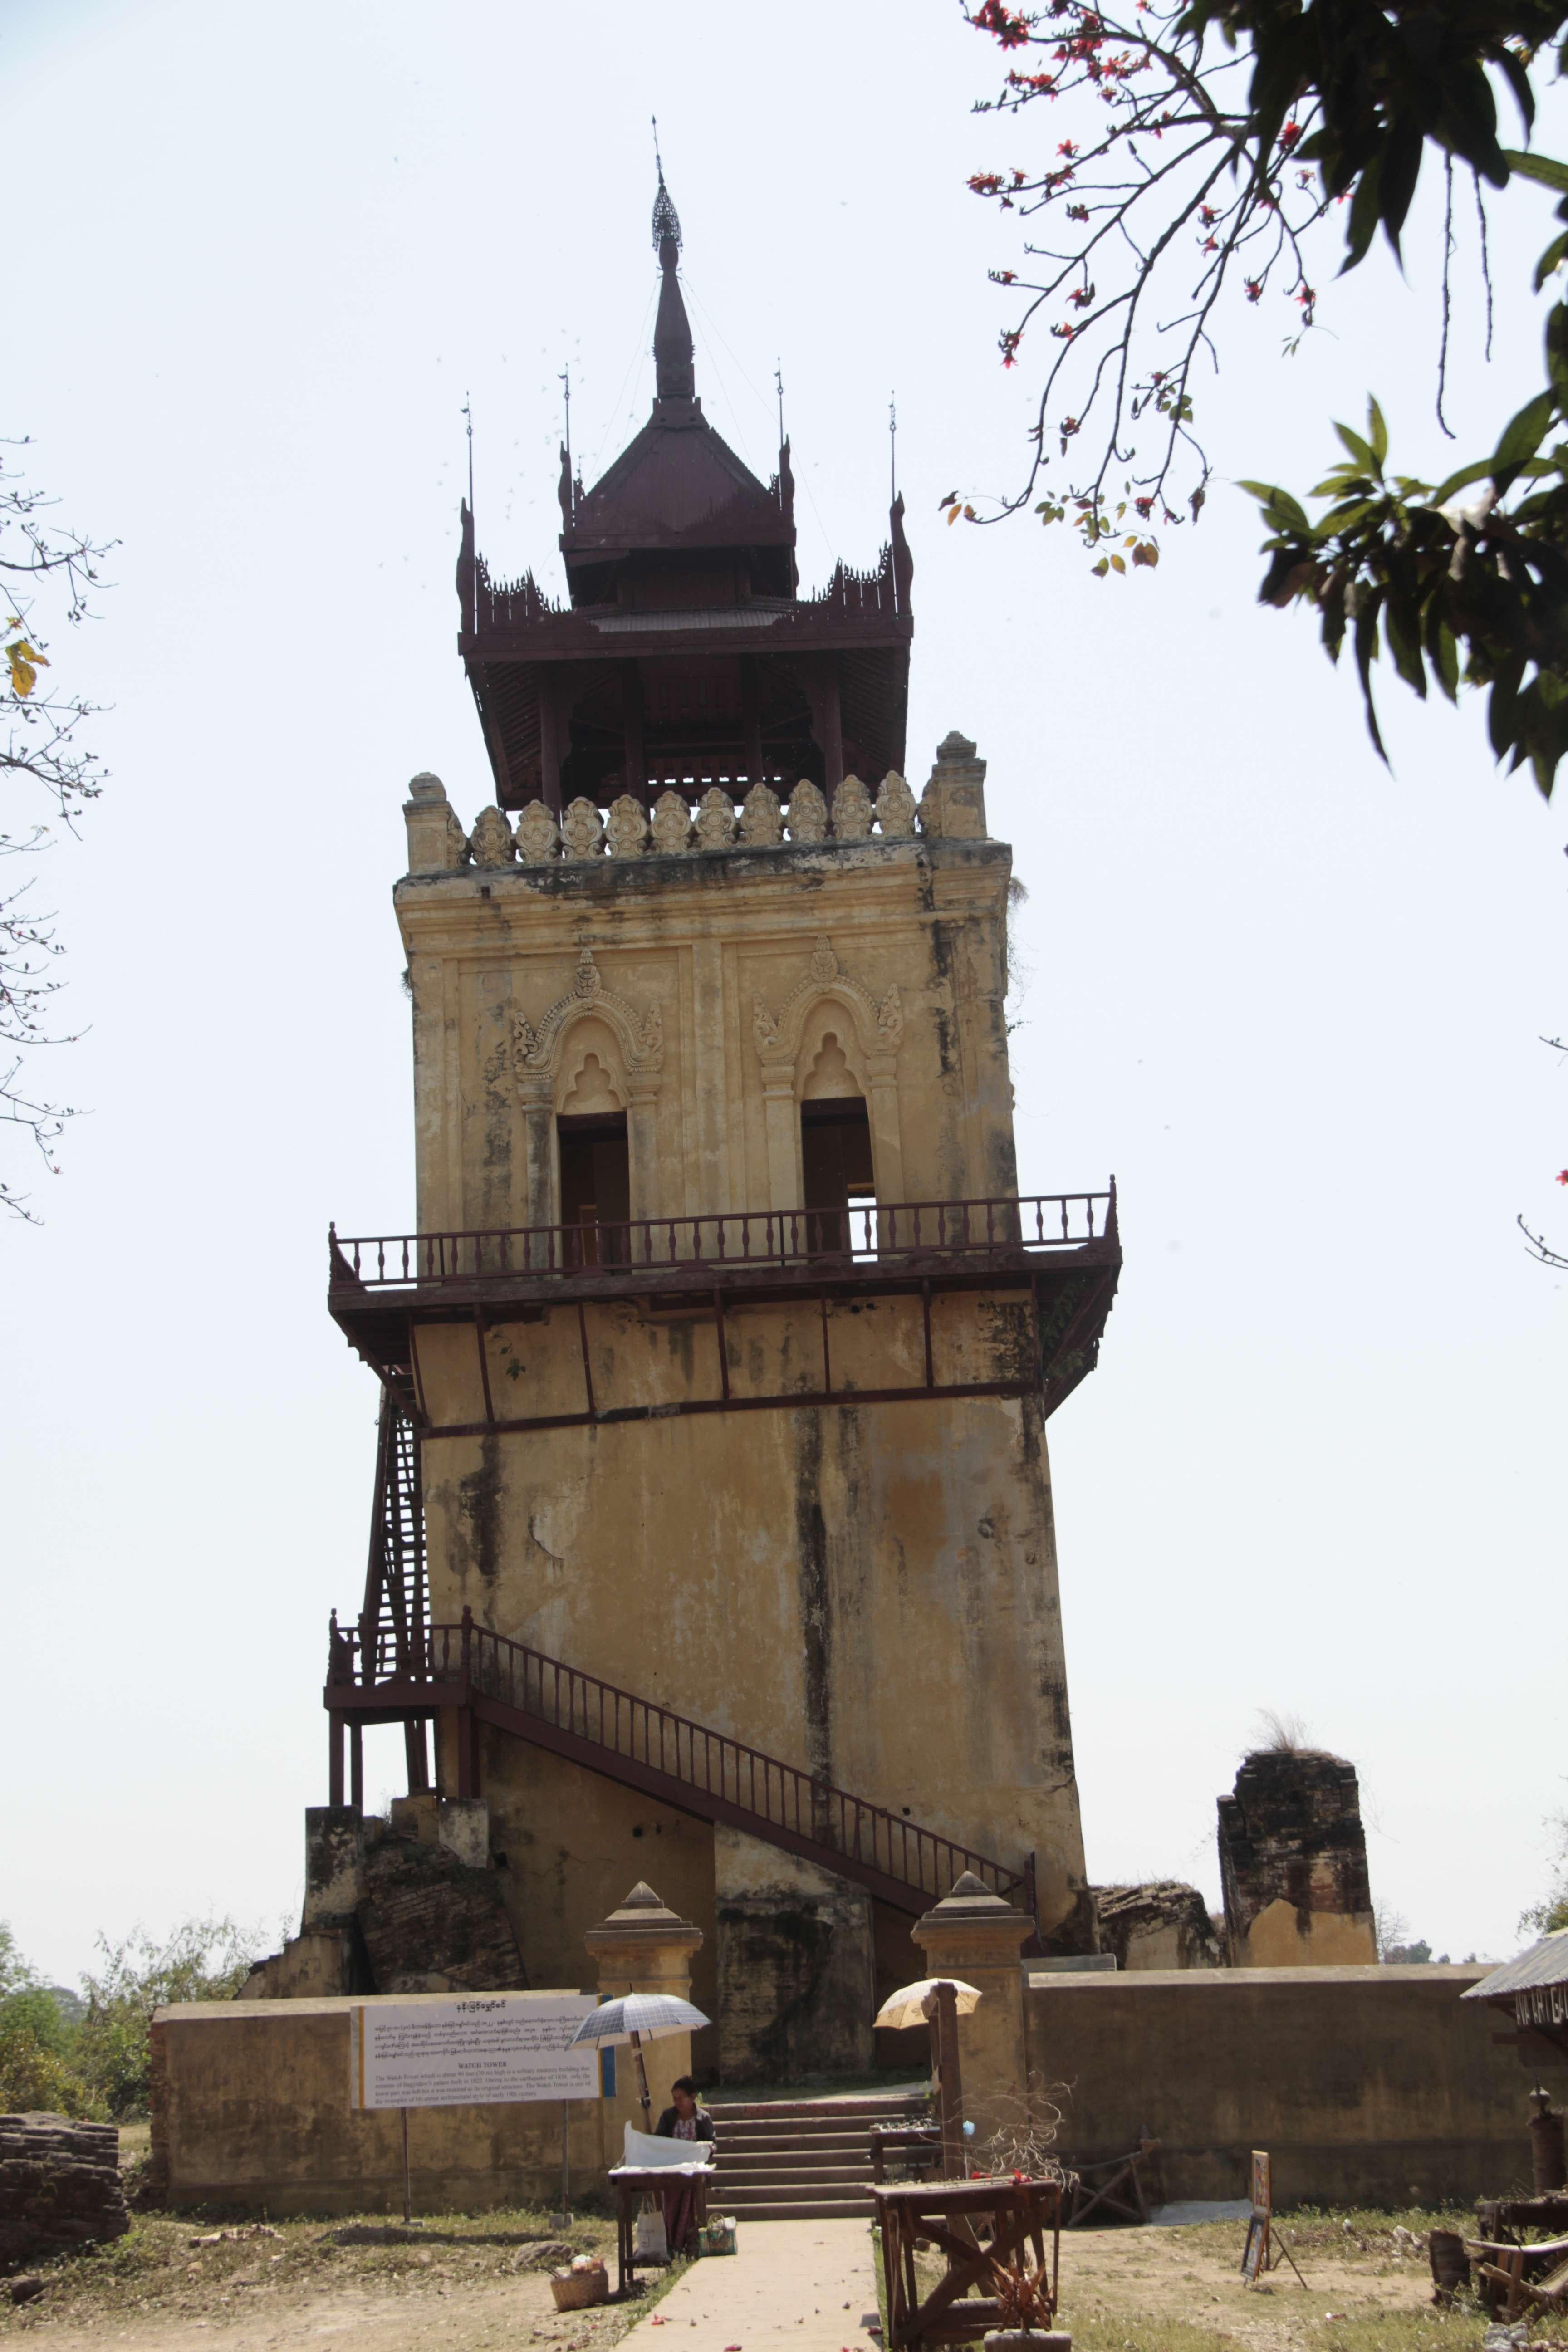 Myanmar fevrier 2019_0965 Mandalay Inwa tour du palais